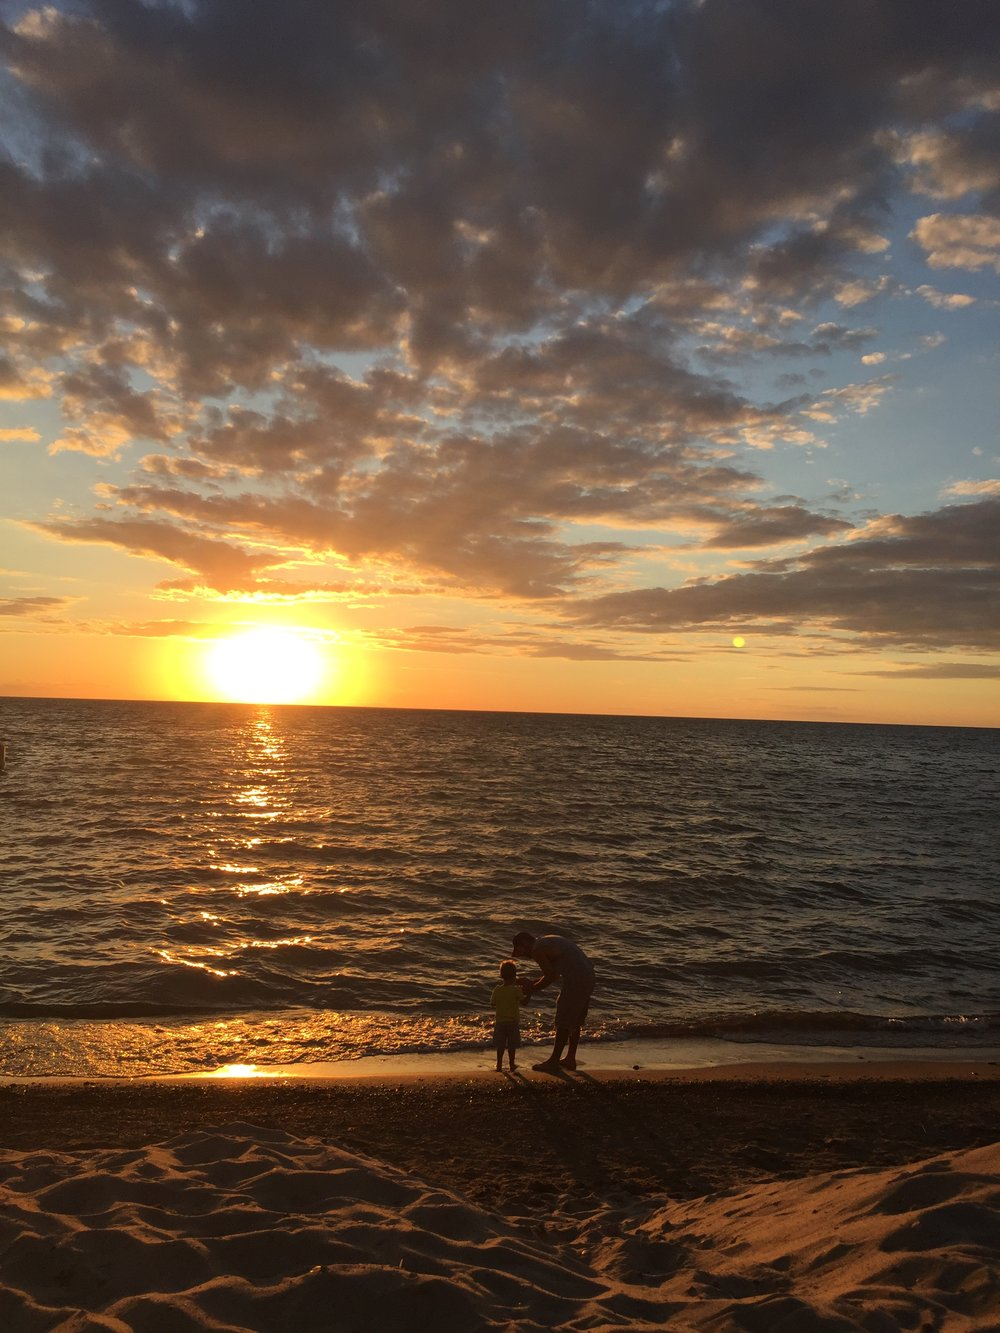 Lake Michigan sunset | July | Weko Beach/Bridgman, MI